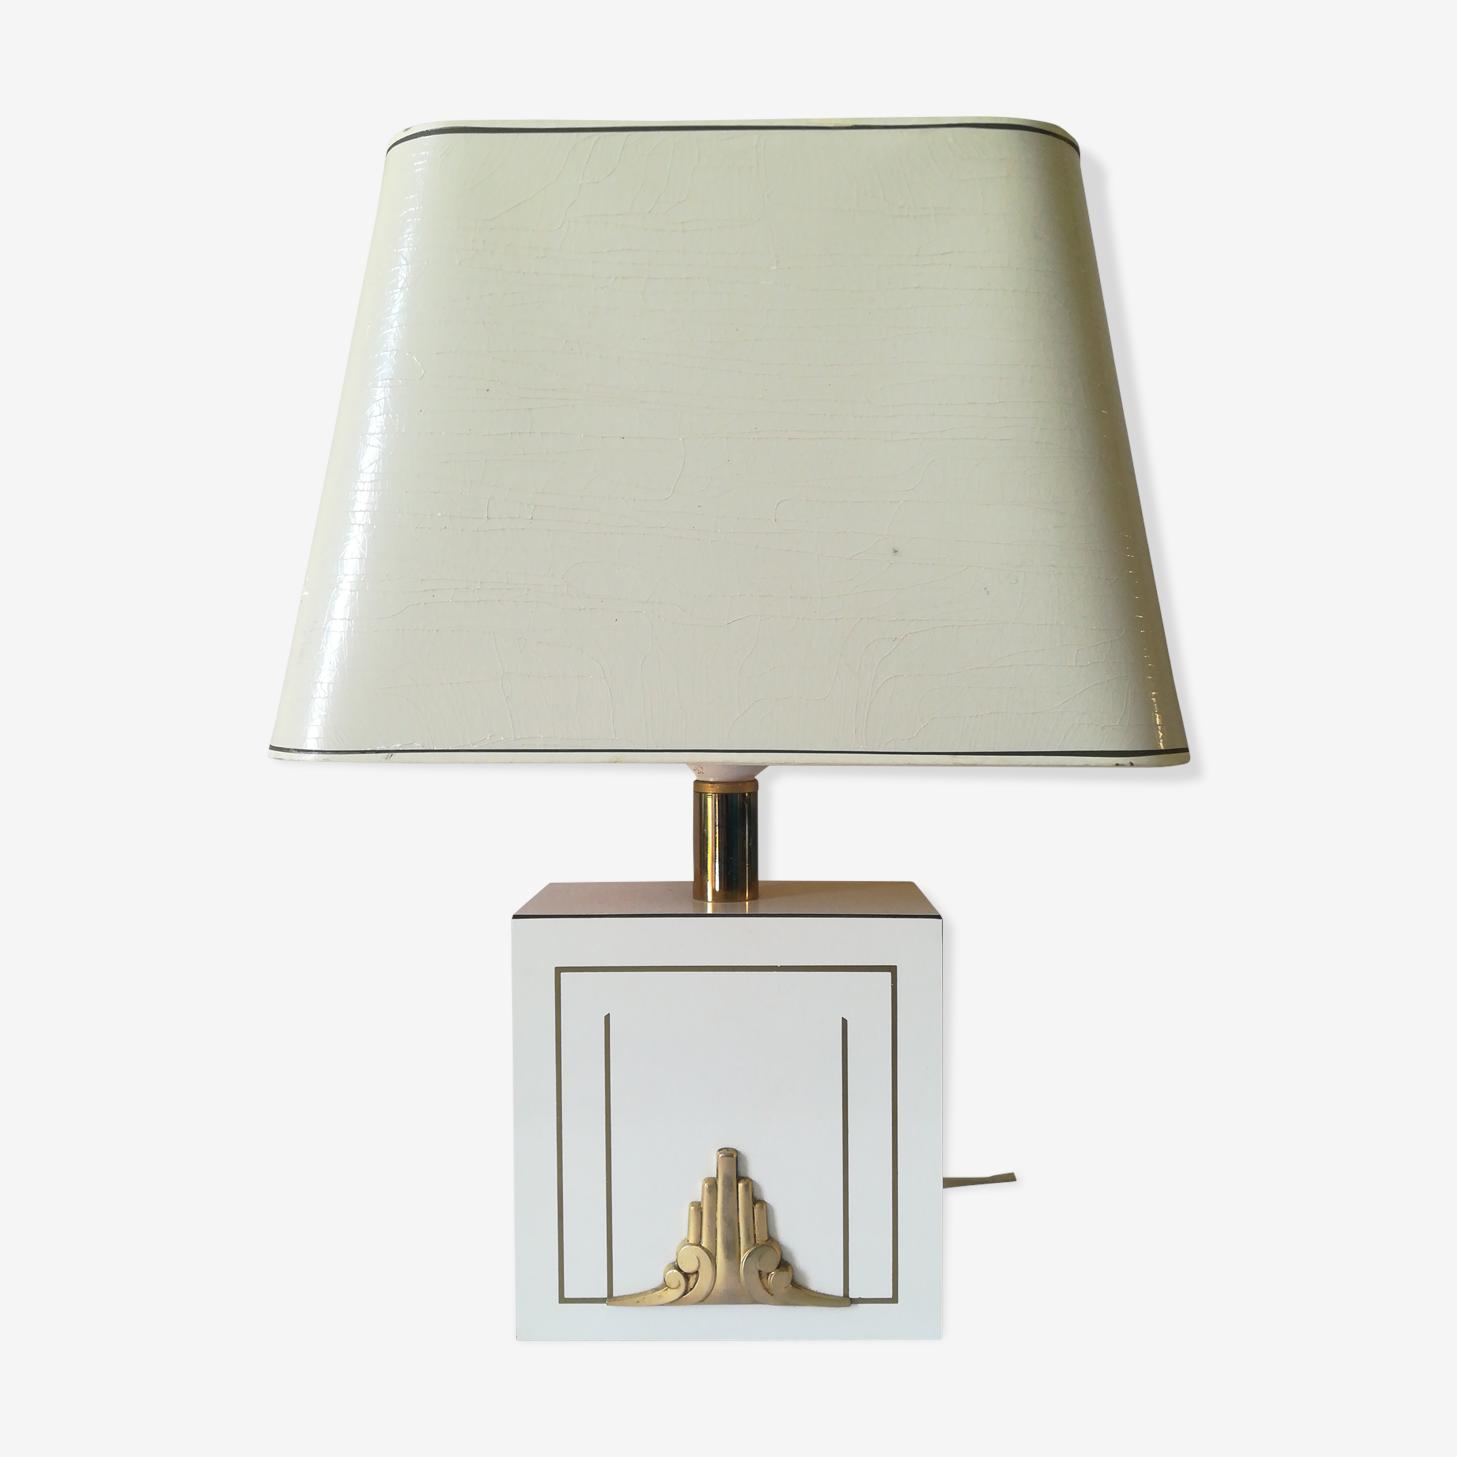 Lampe style Hollywood Regency